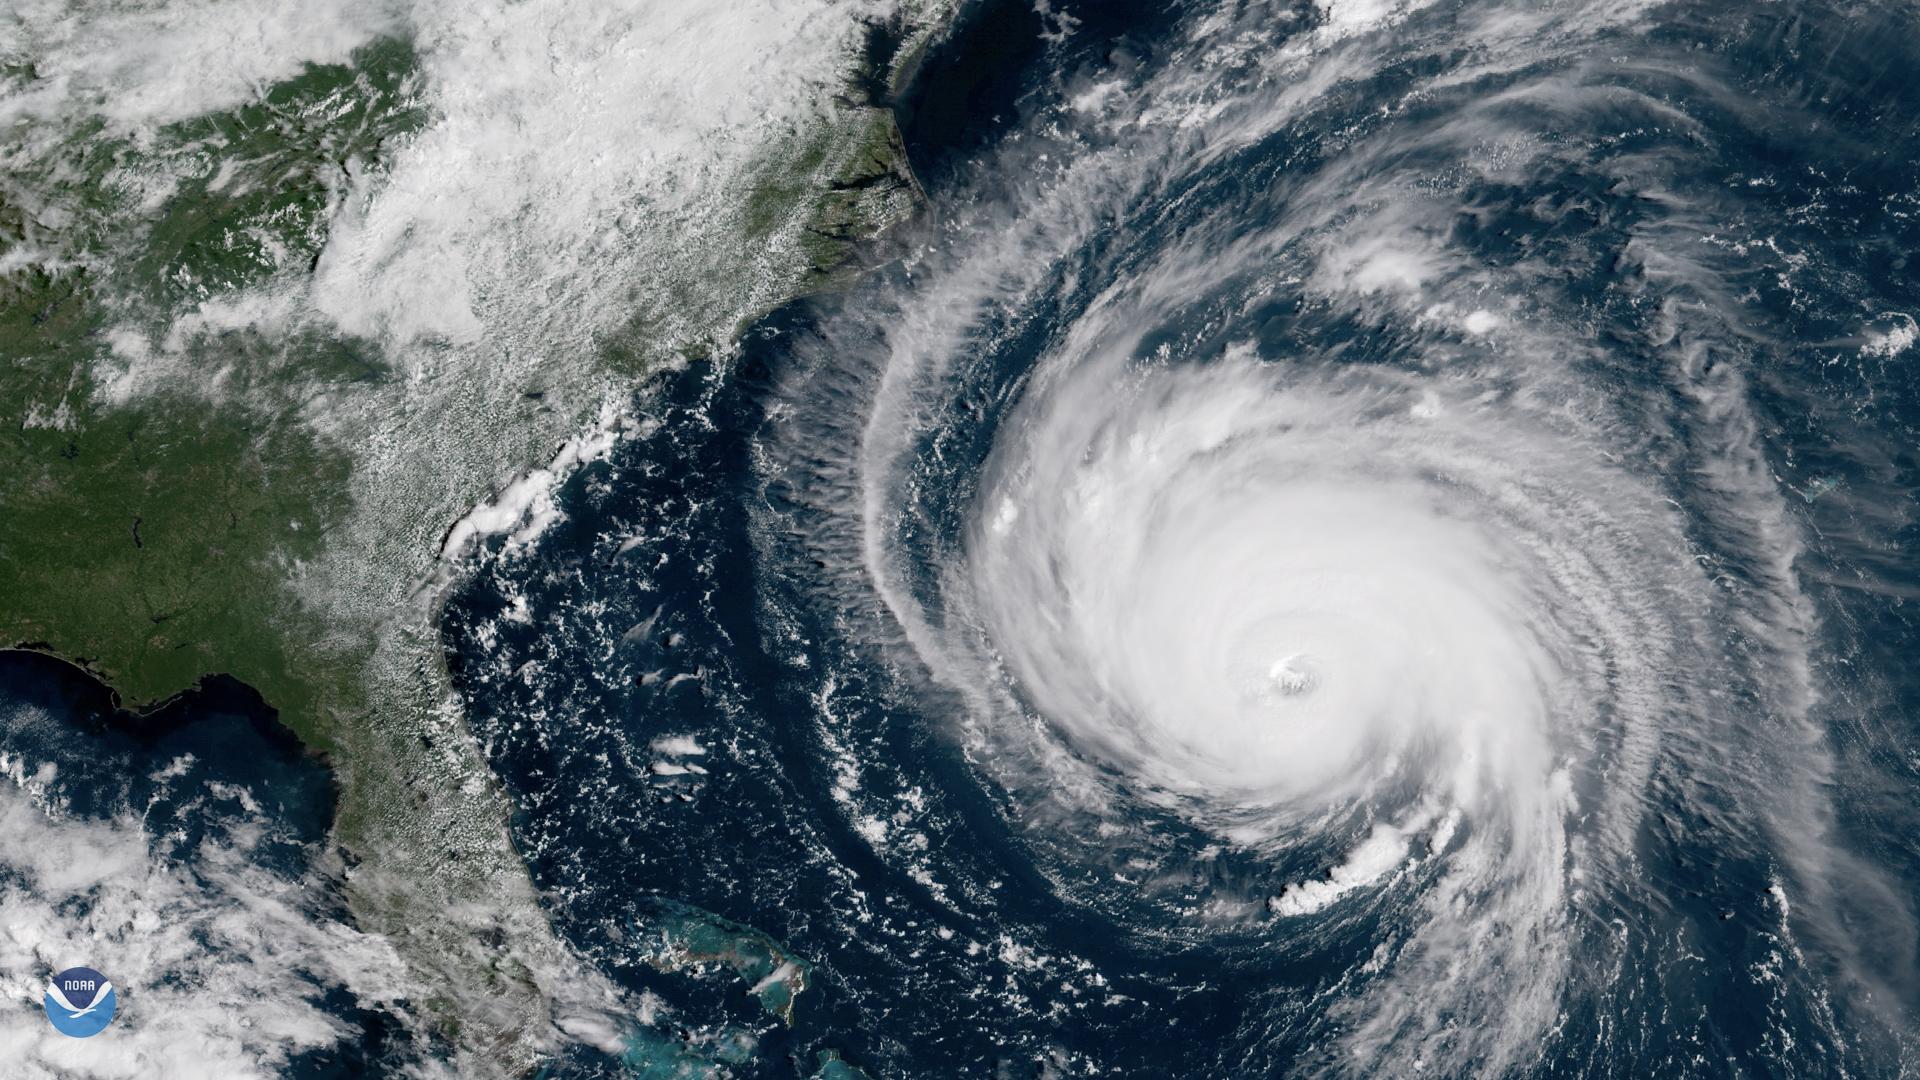 Hurricane Florence Nears the East Coast